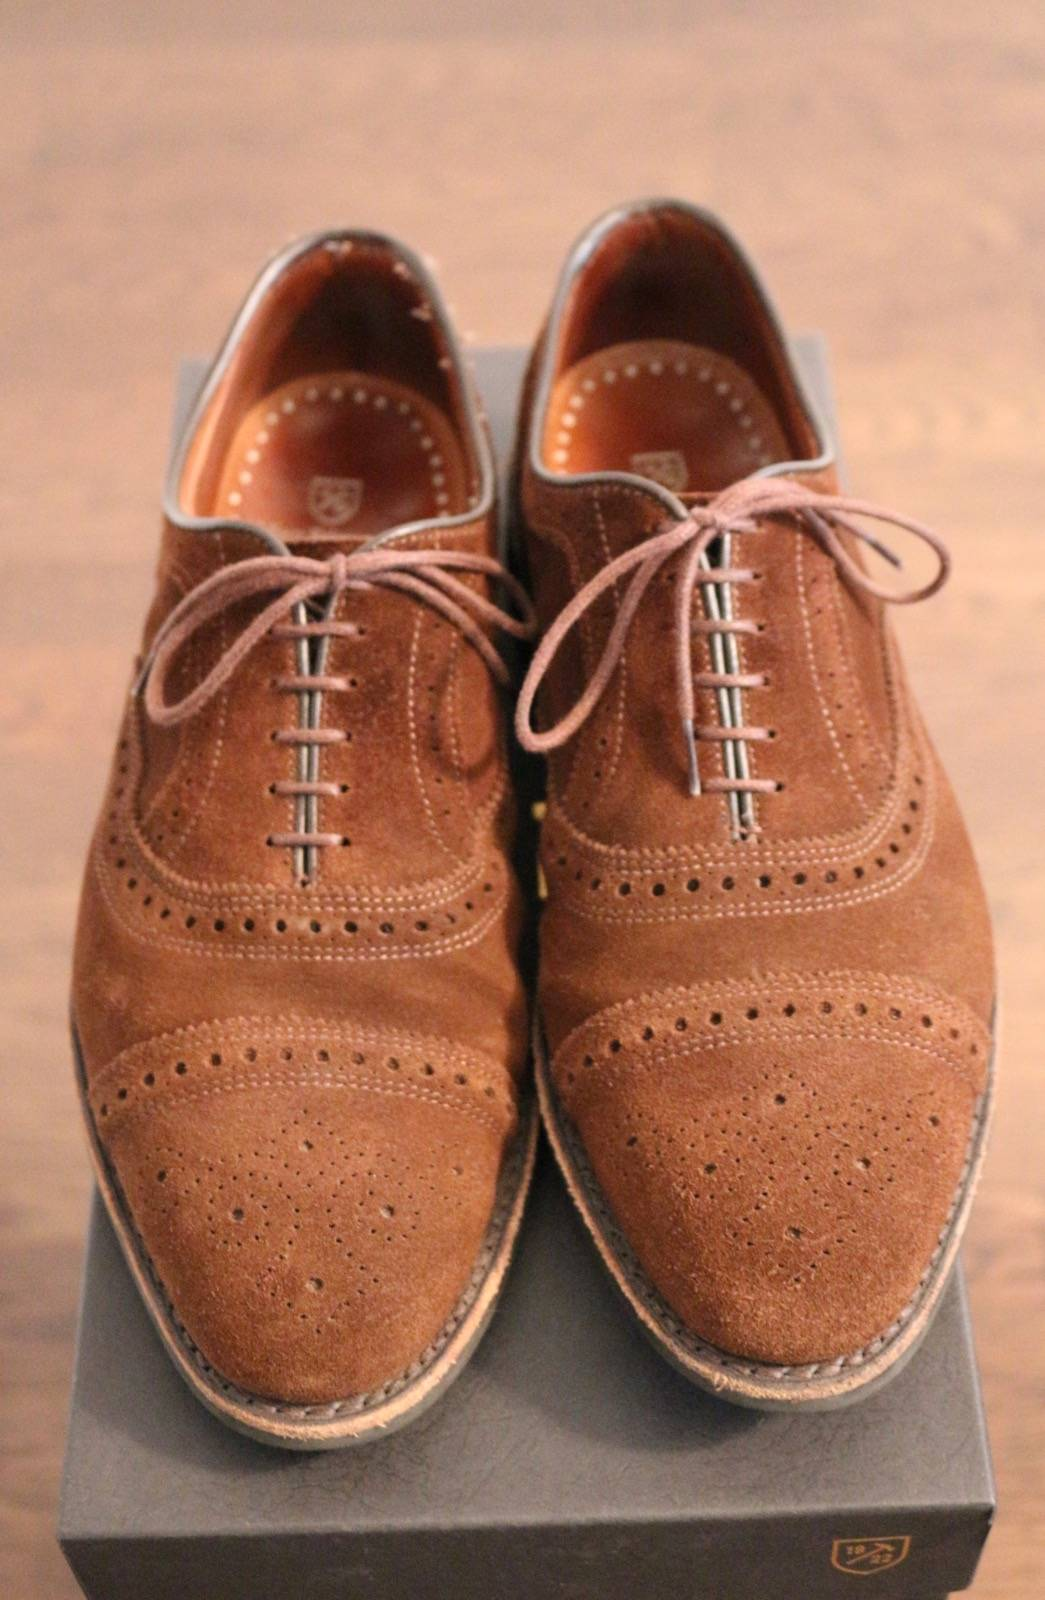 allen edmonds strand dark brown suede 9 5 2e size 9 5 formal shoes